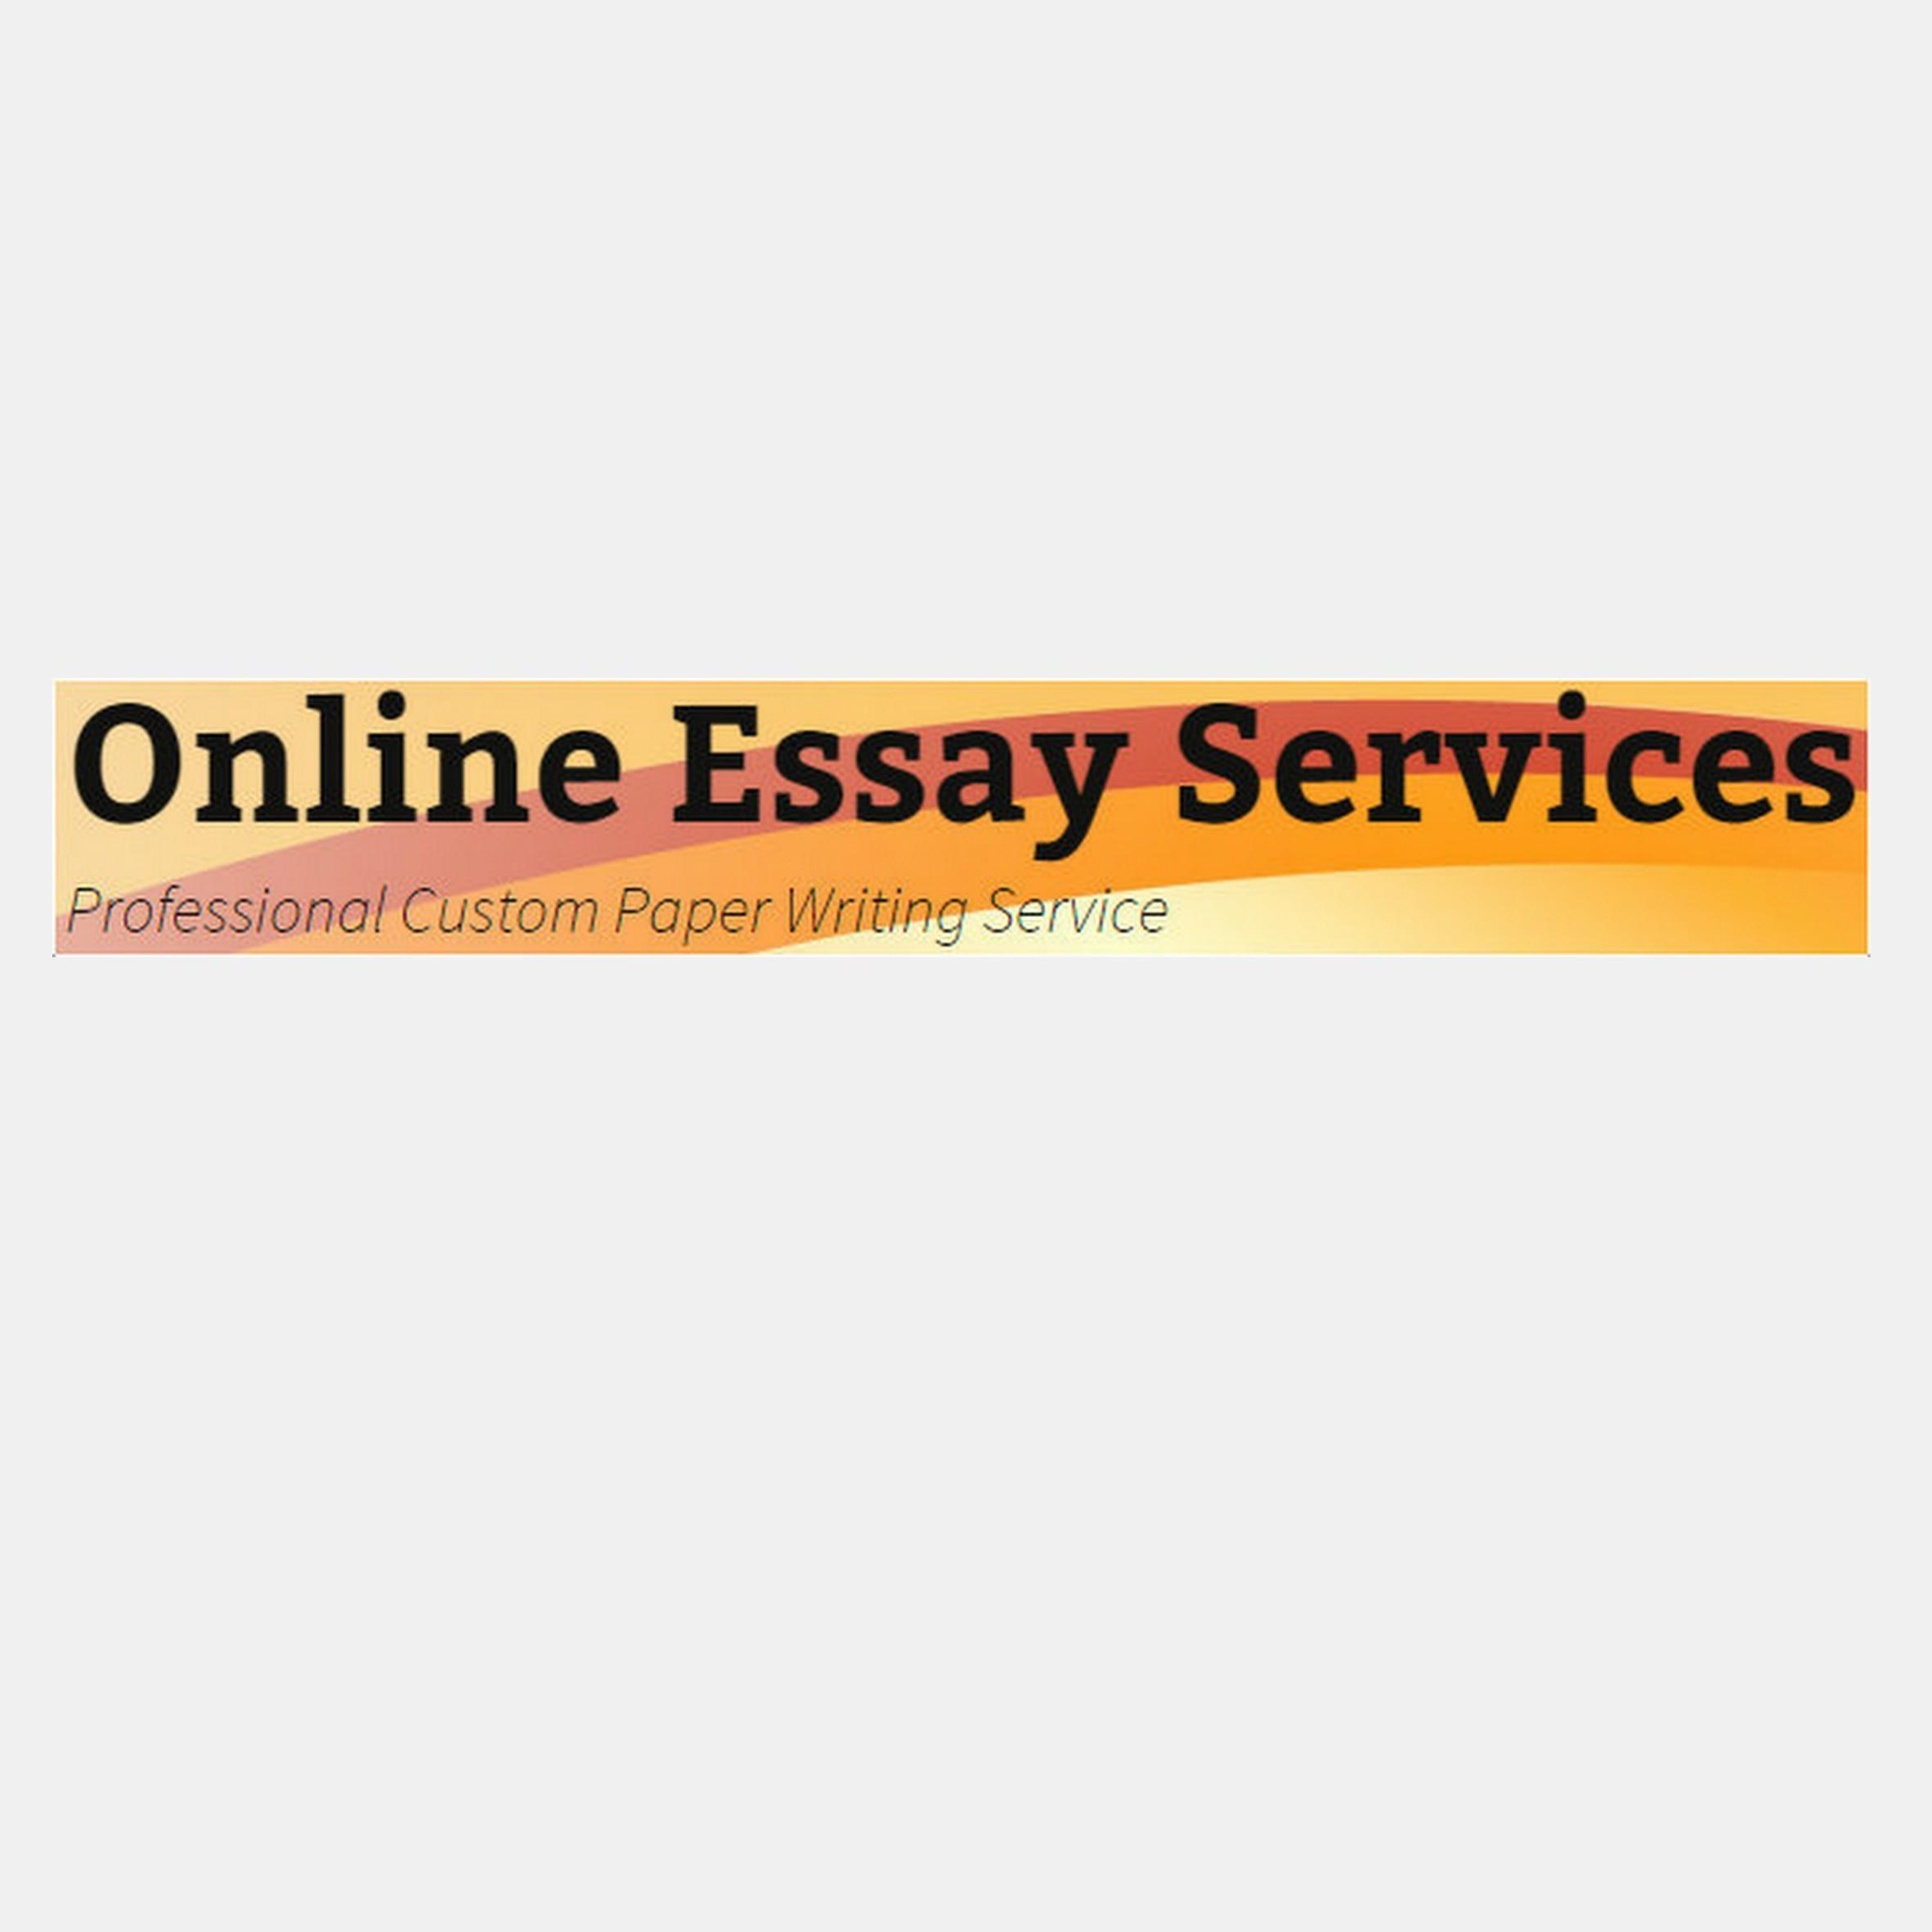 online essay service online essay  online essay service